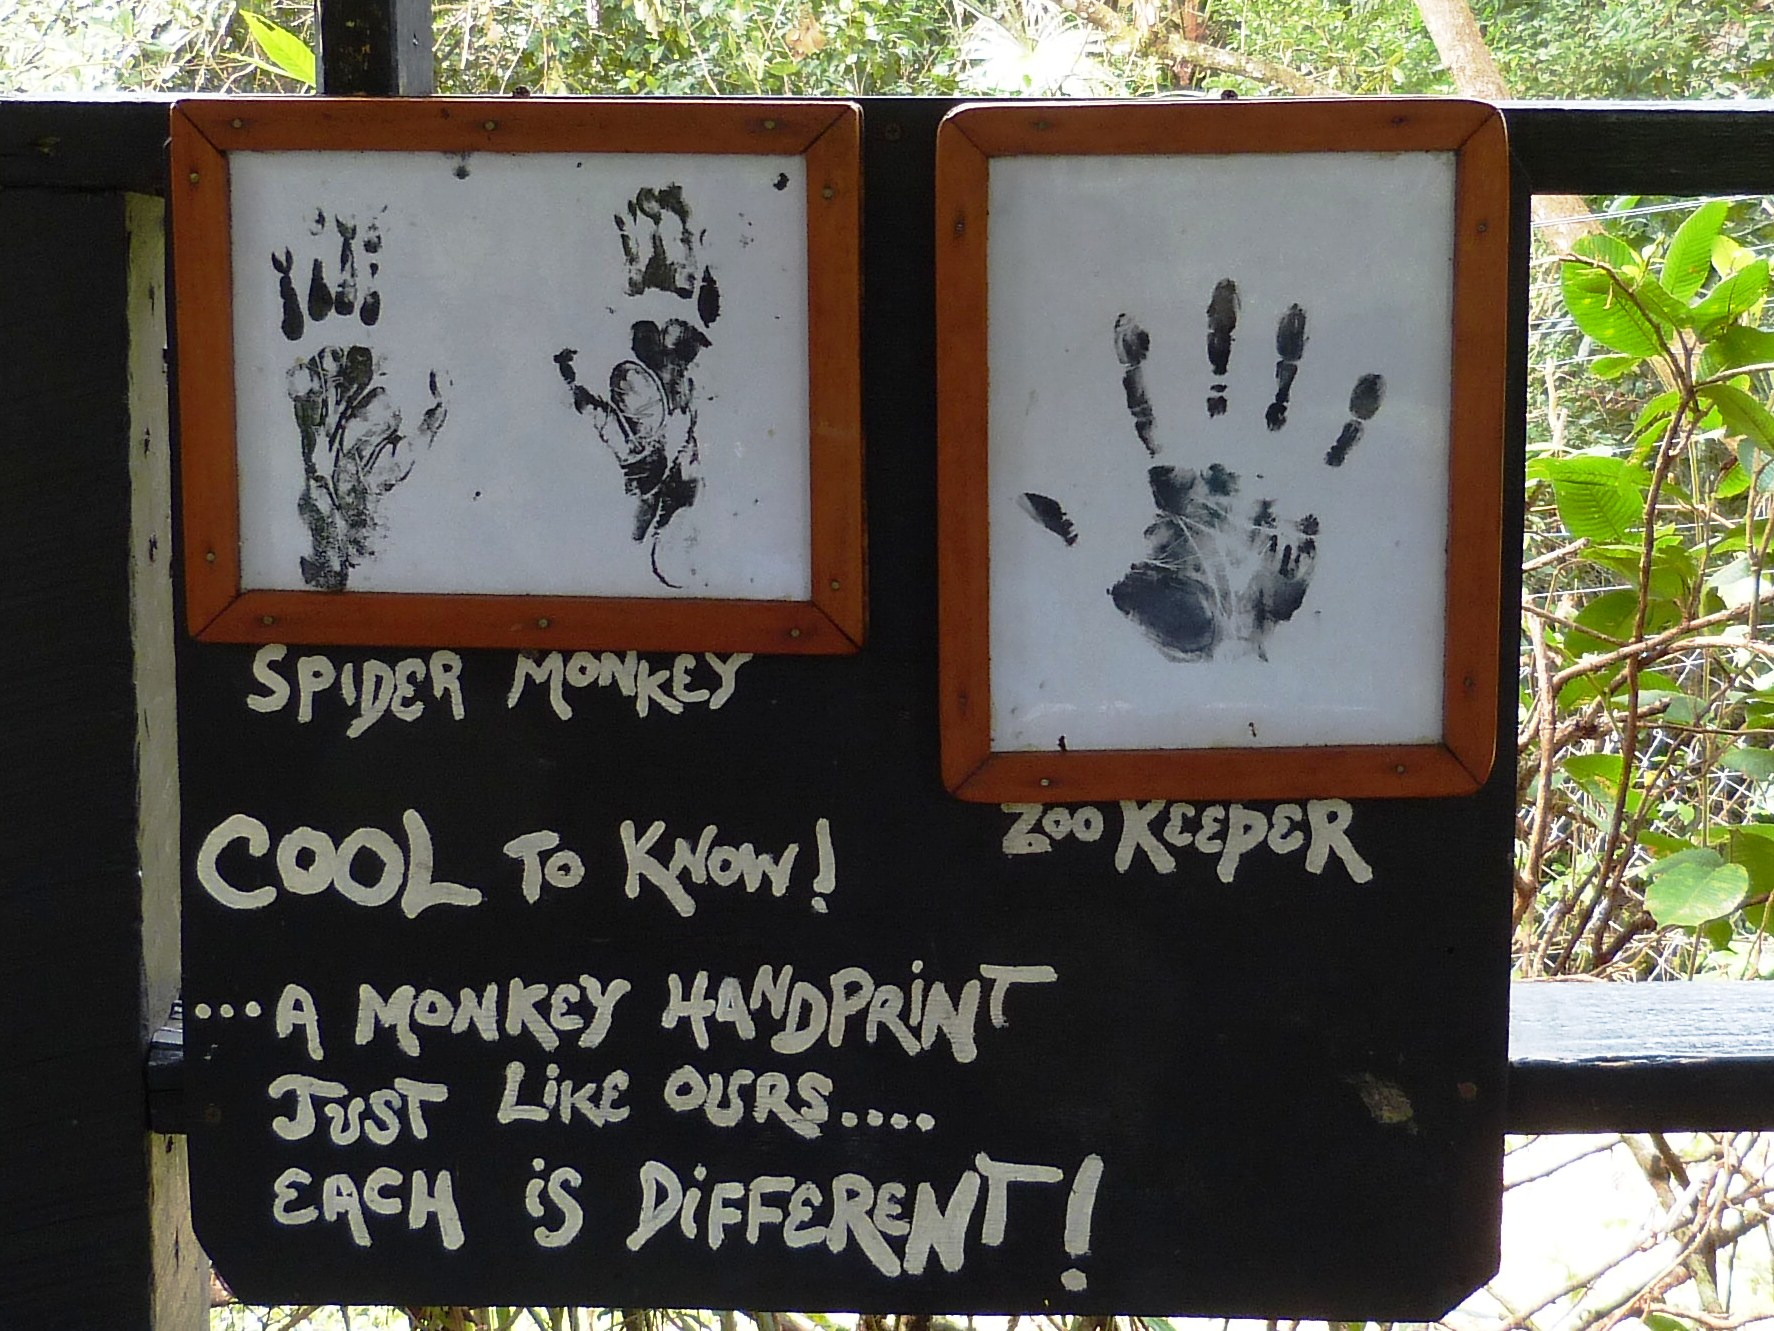 Monkey sign at zoo